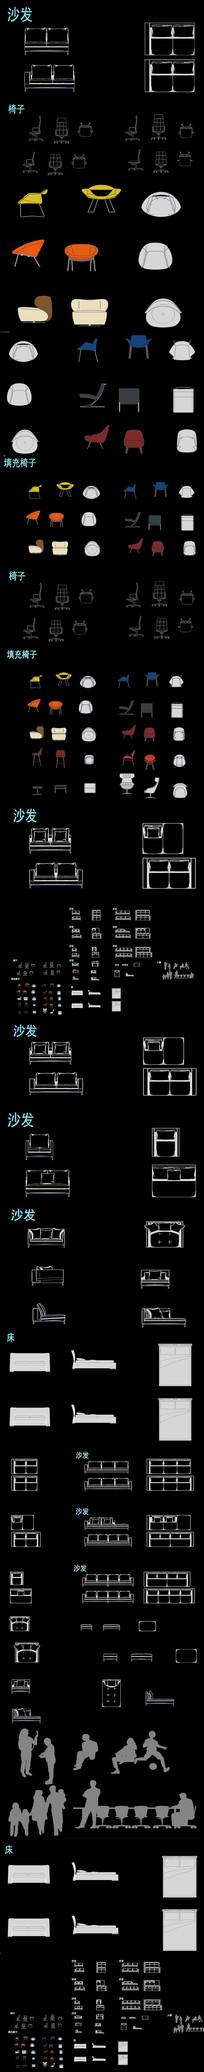 装修素材动态块CAD图库